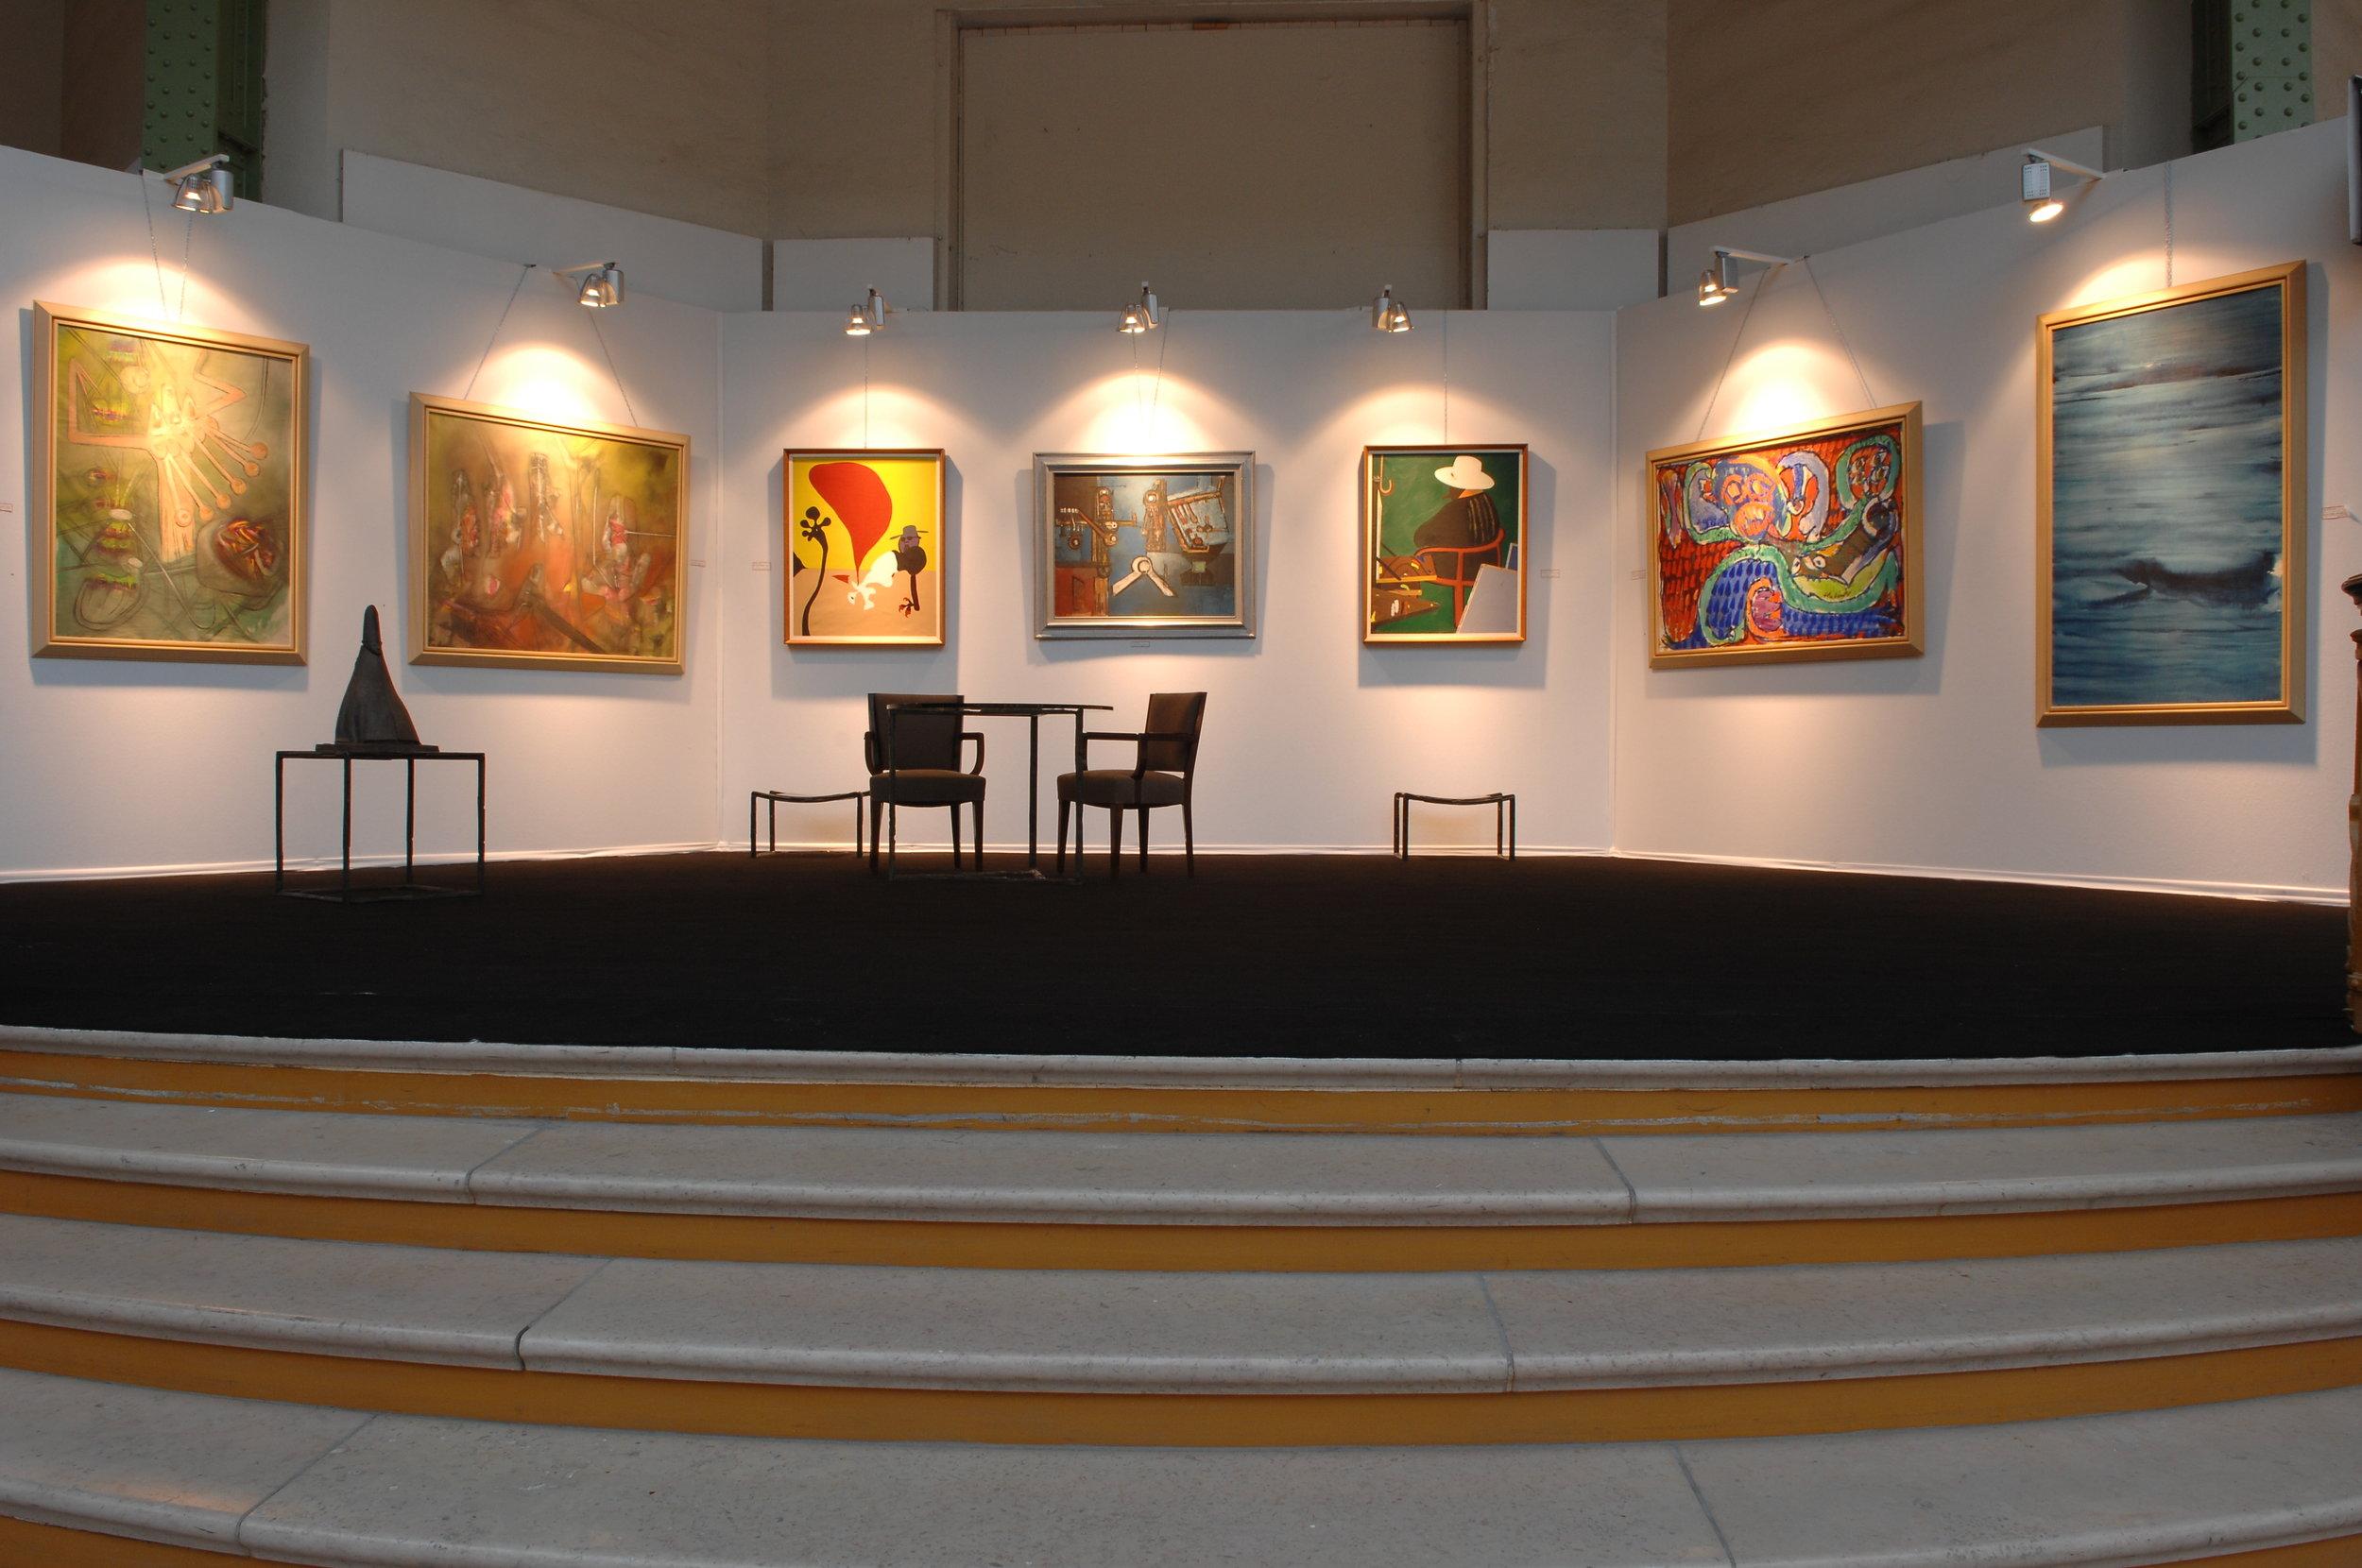 Art Paris, Grand Palais, 2008 - Alechinsky, Arroyo, Matta